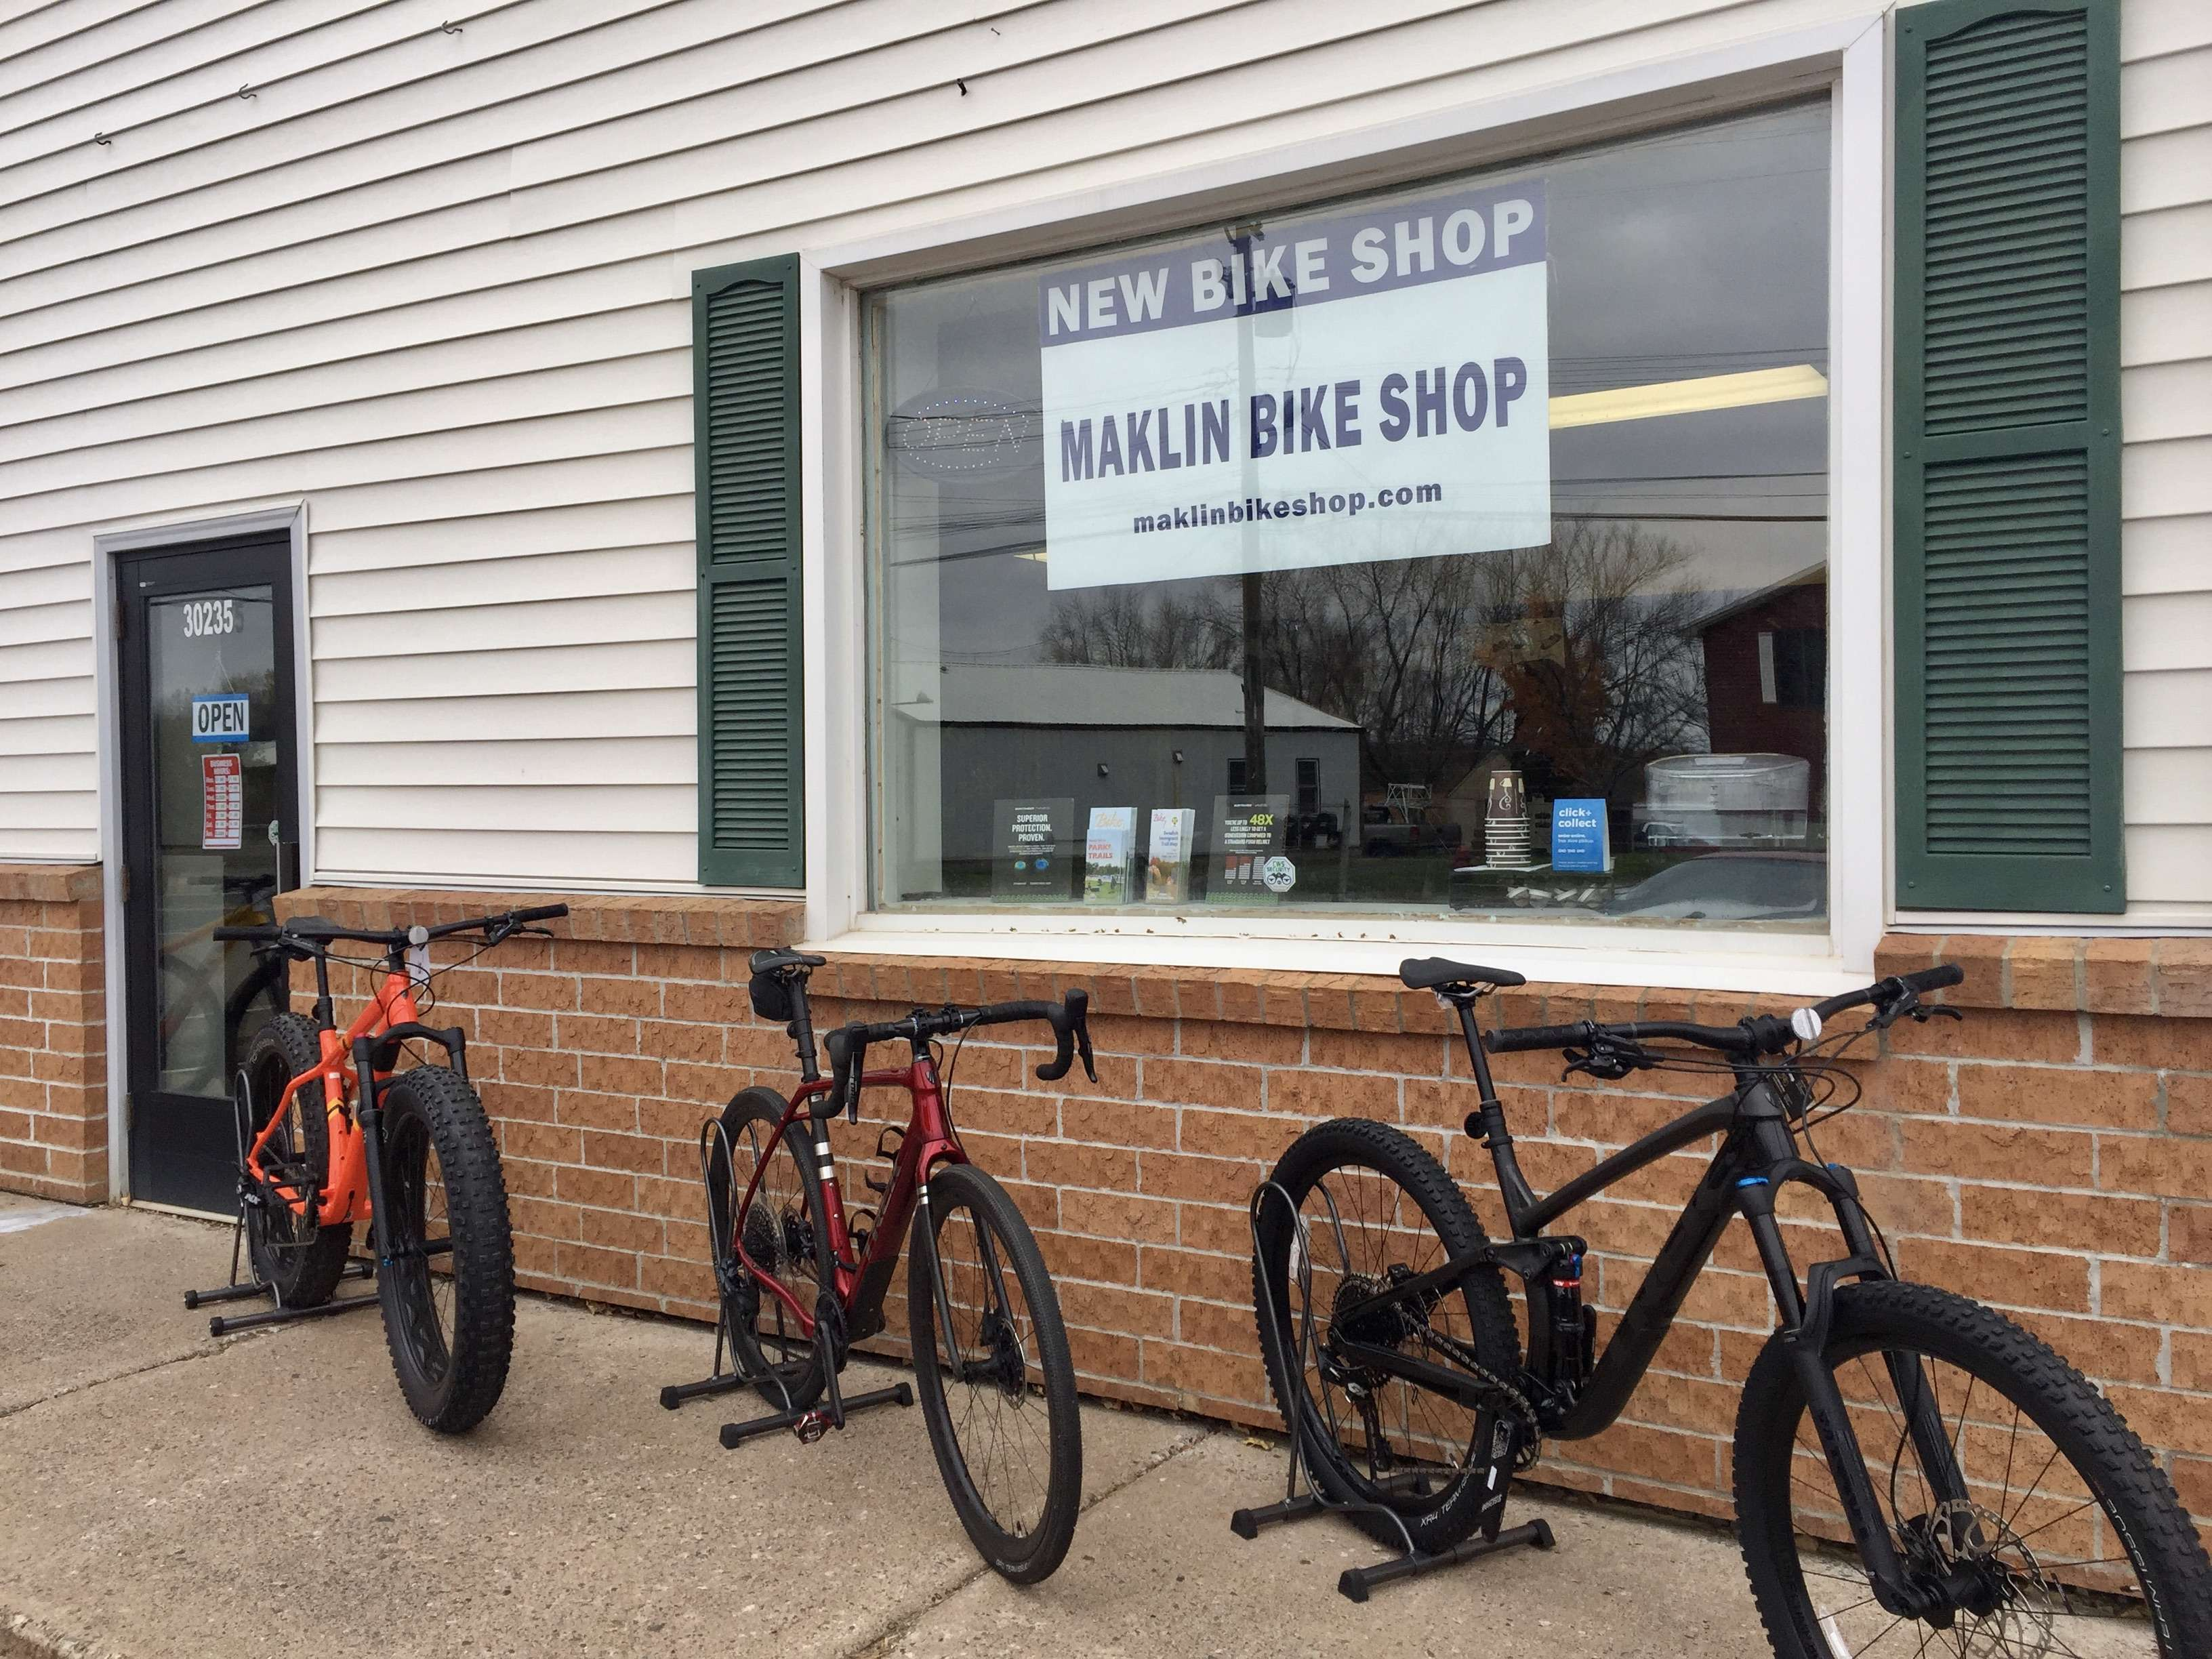 Maklin Bike Shop